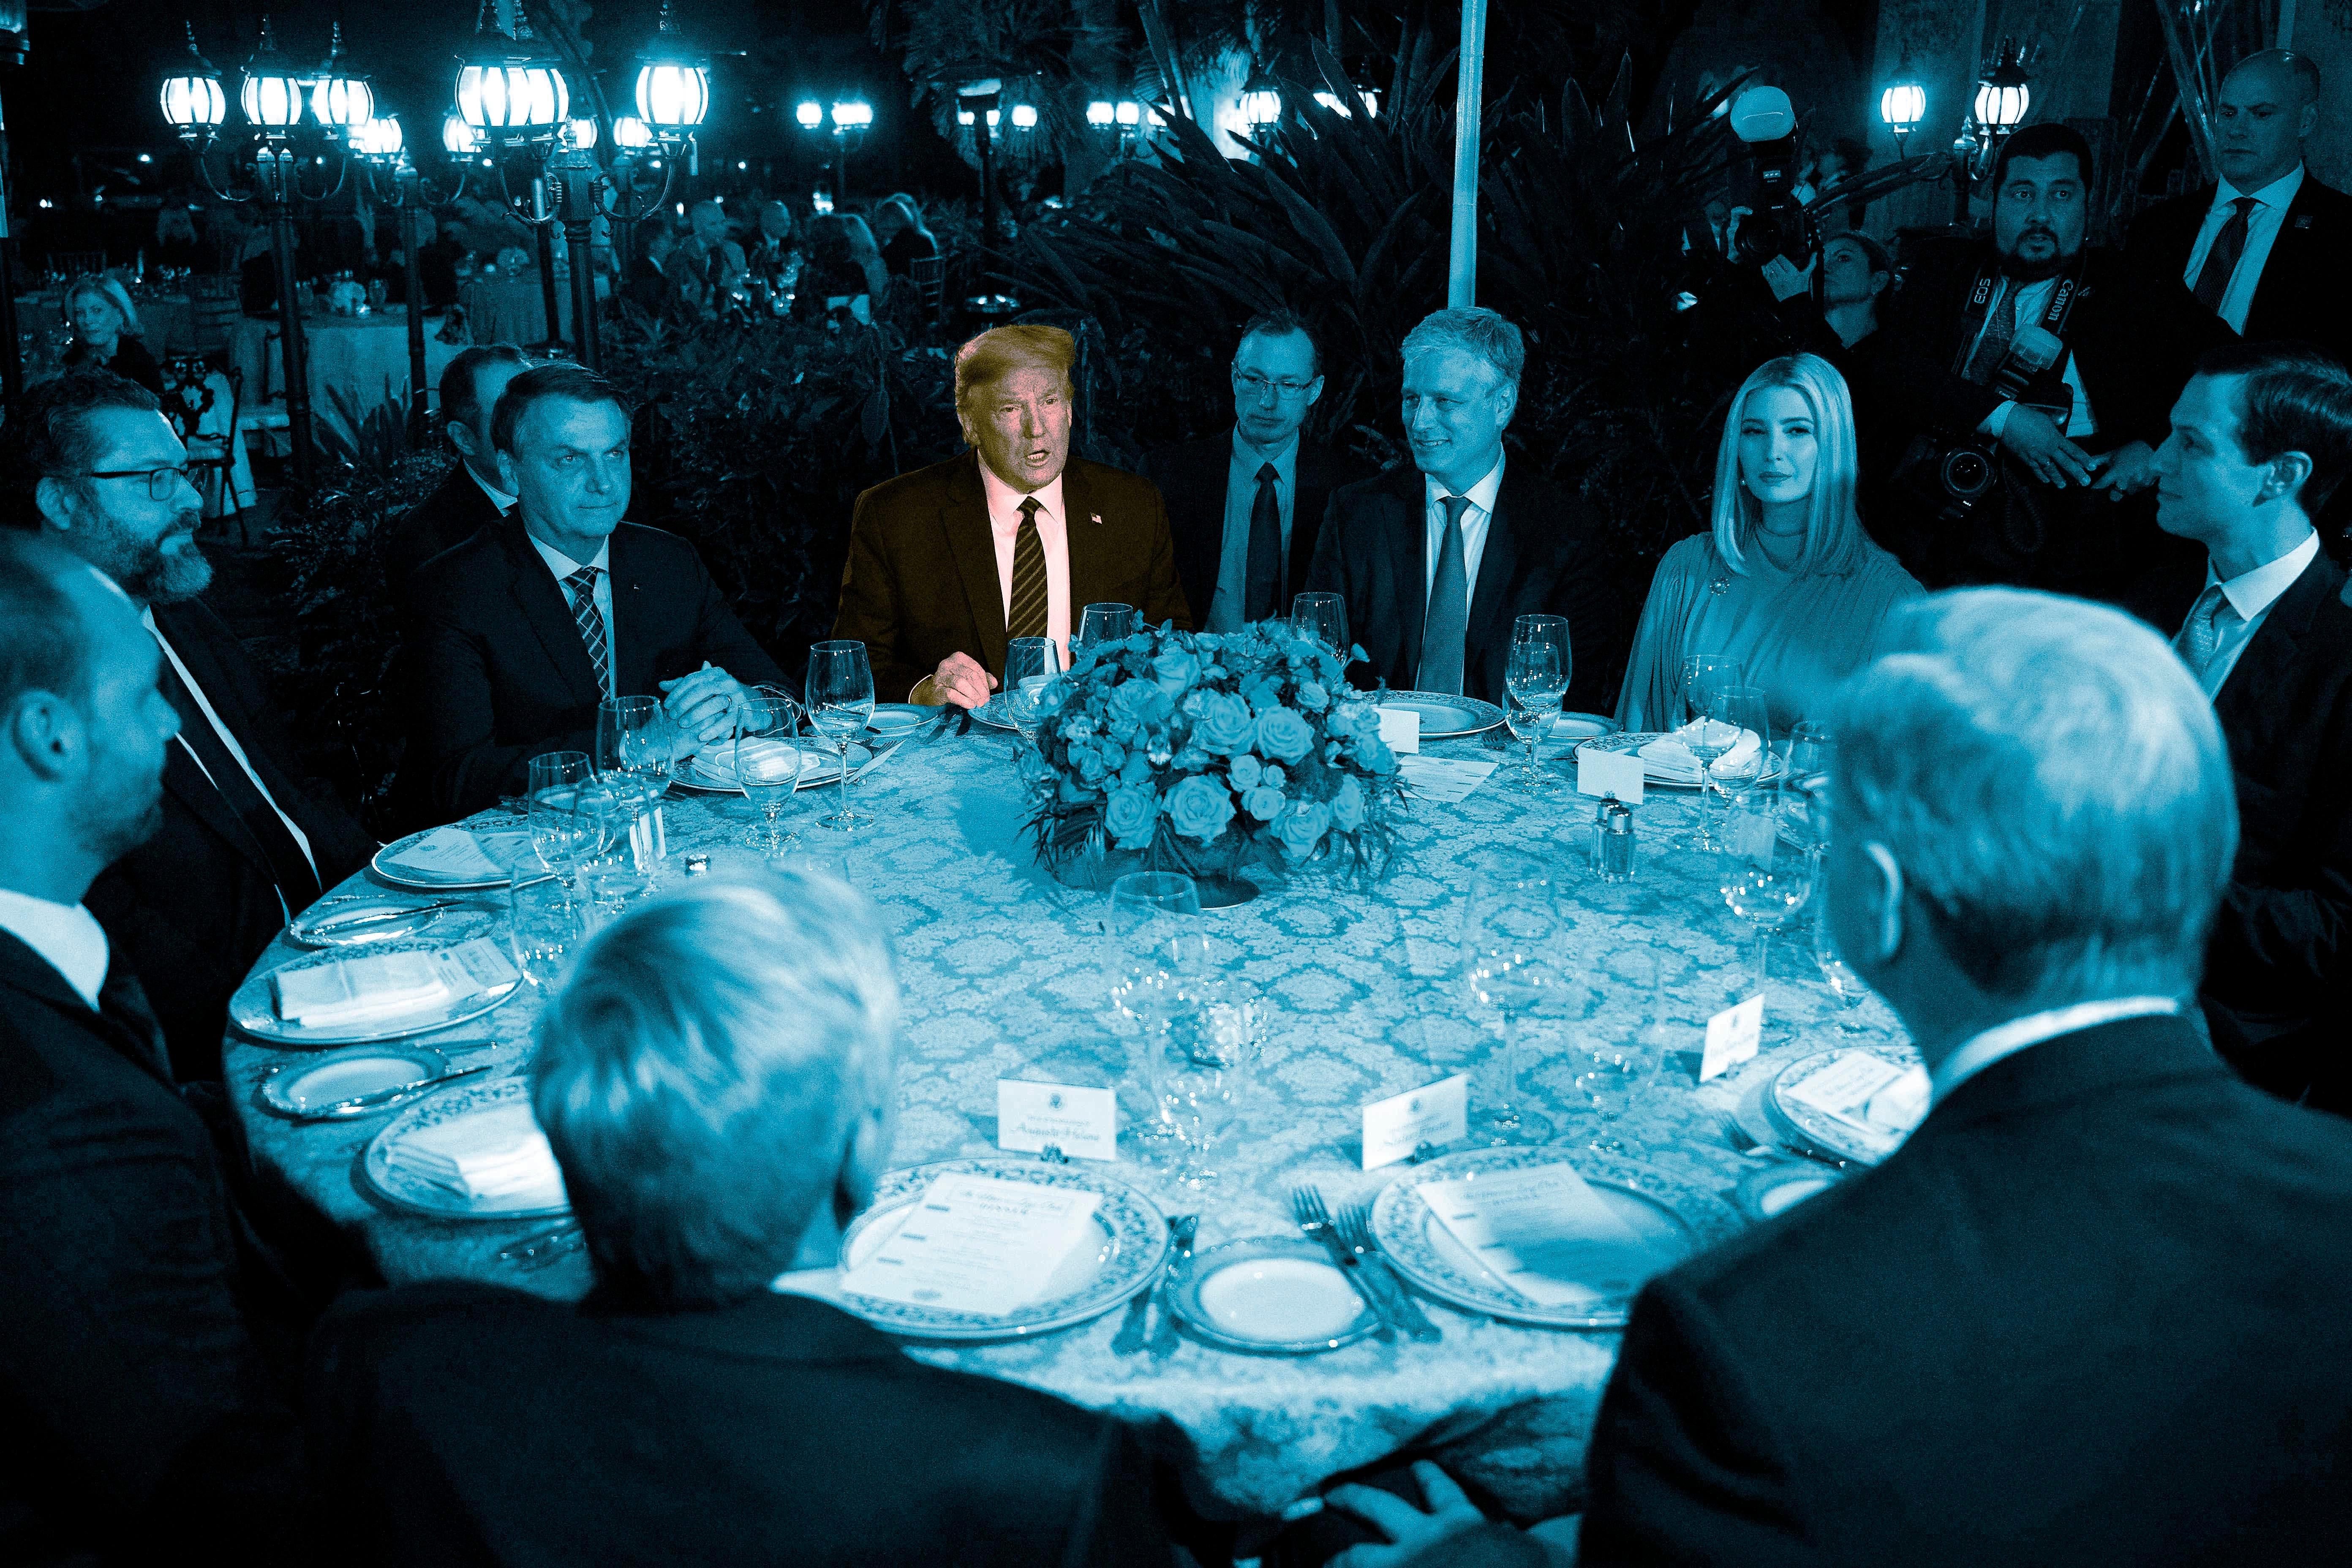 Trump dinner at Mar-a-Lago